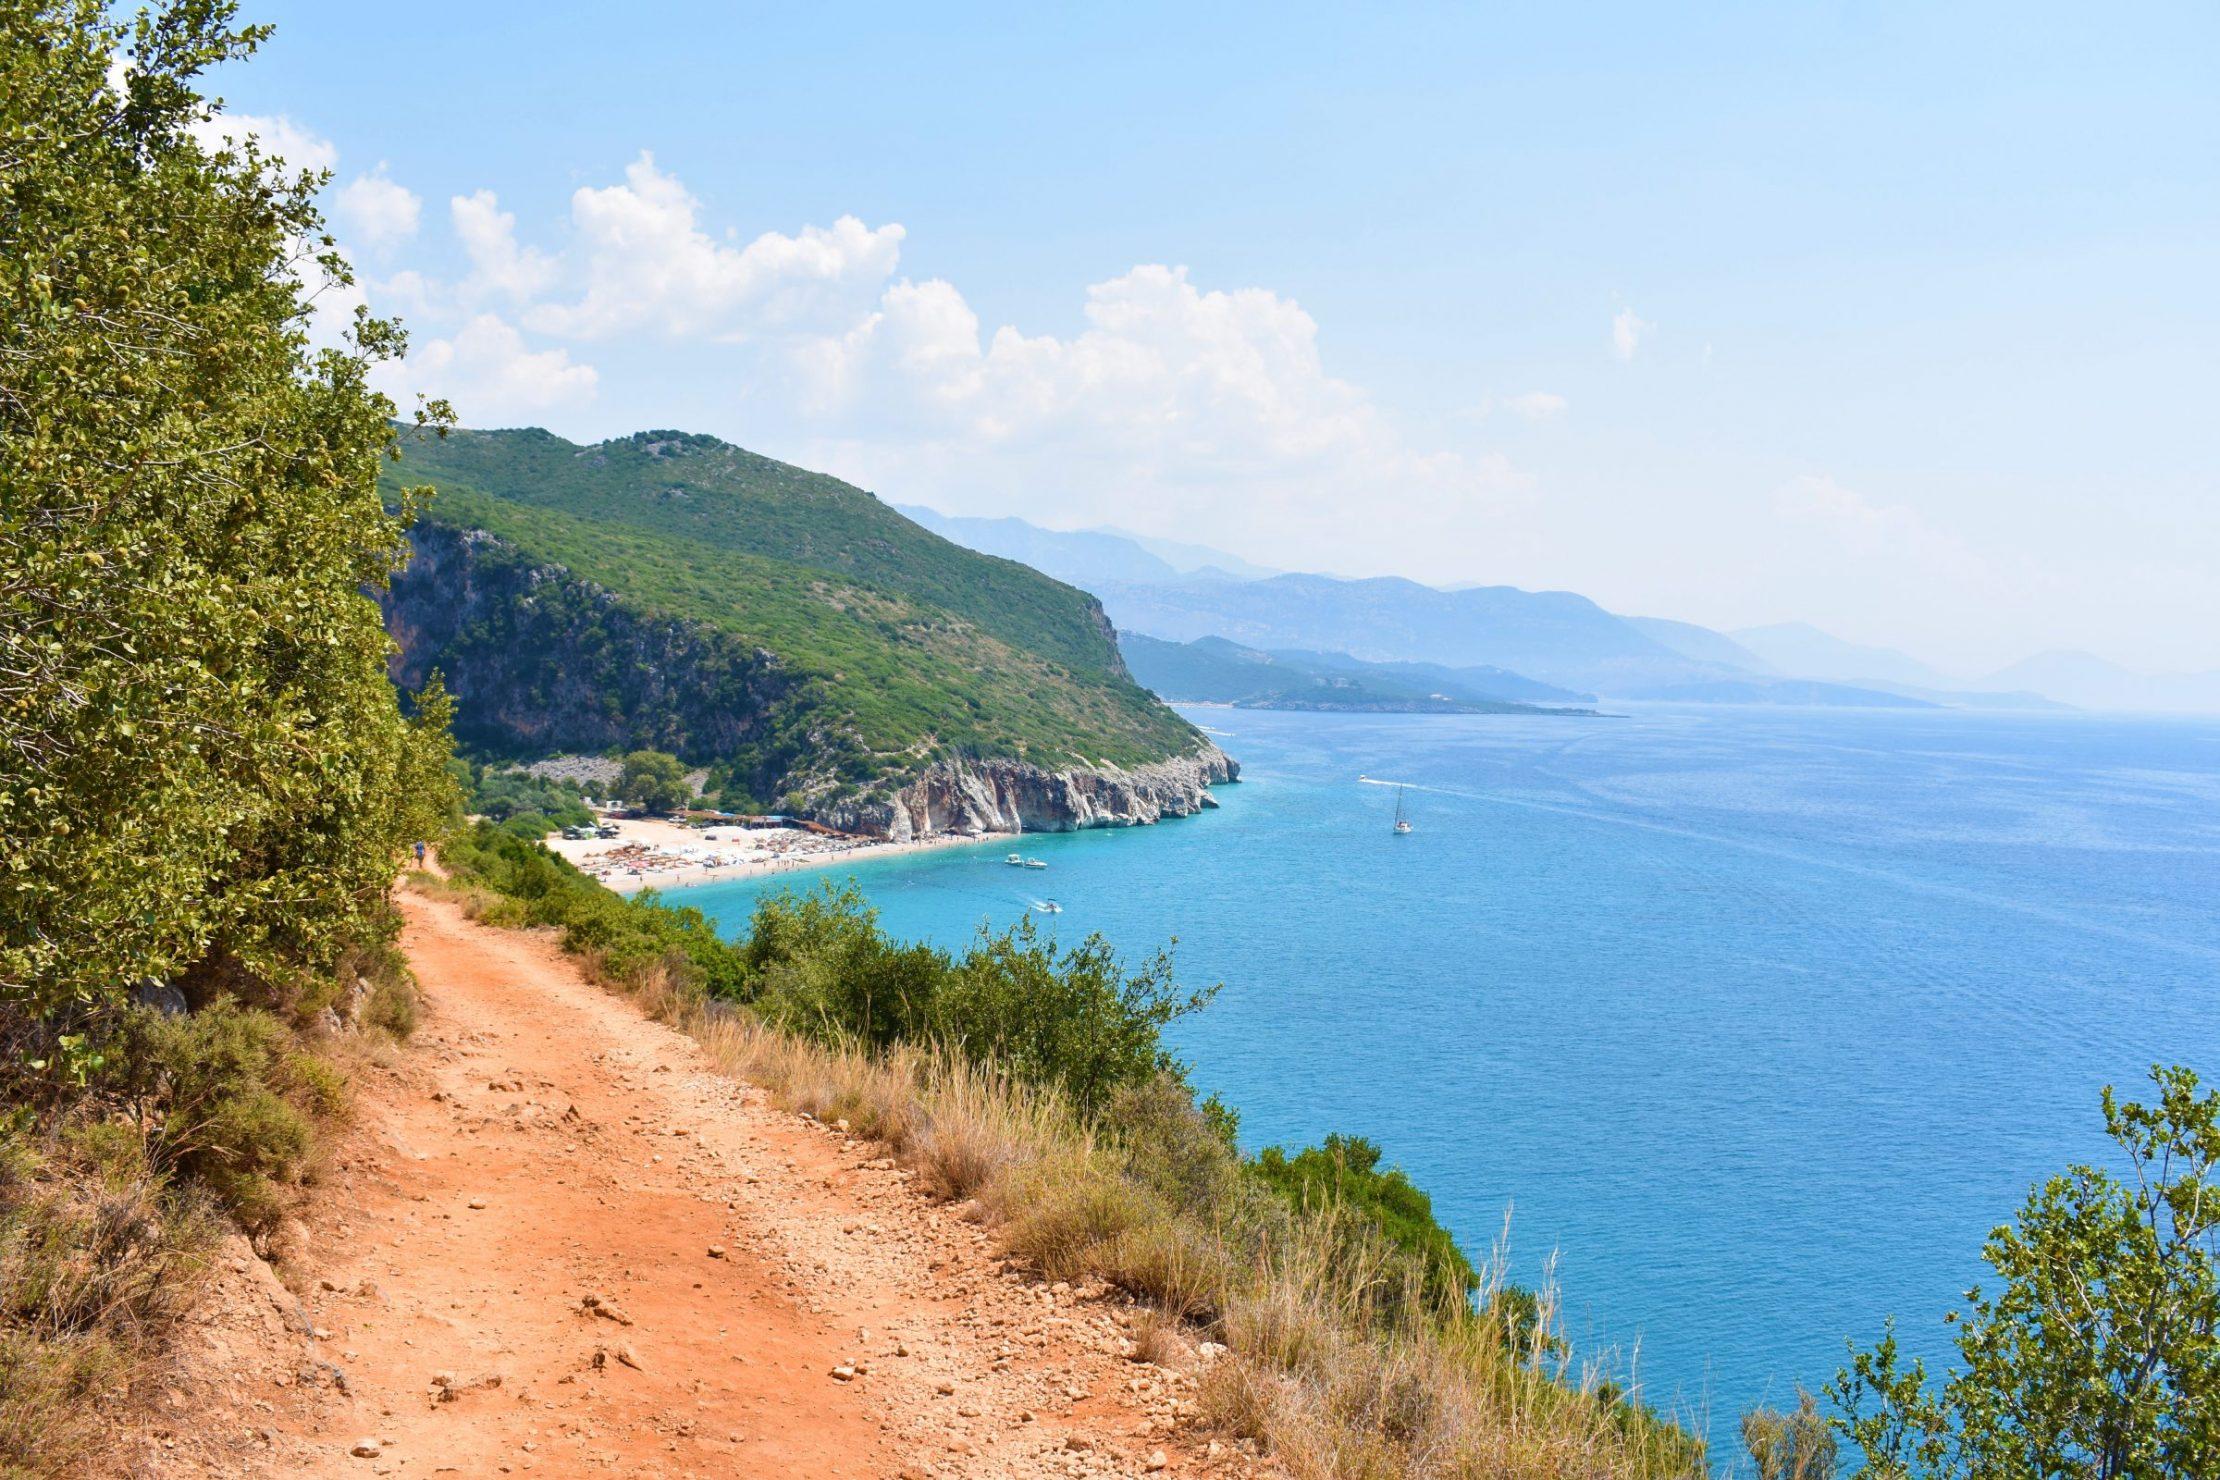 Scenic path leading to Gjipe Canyon beach